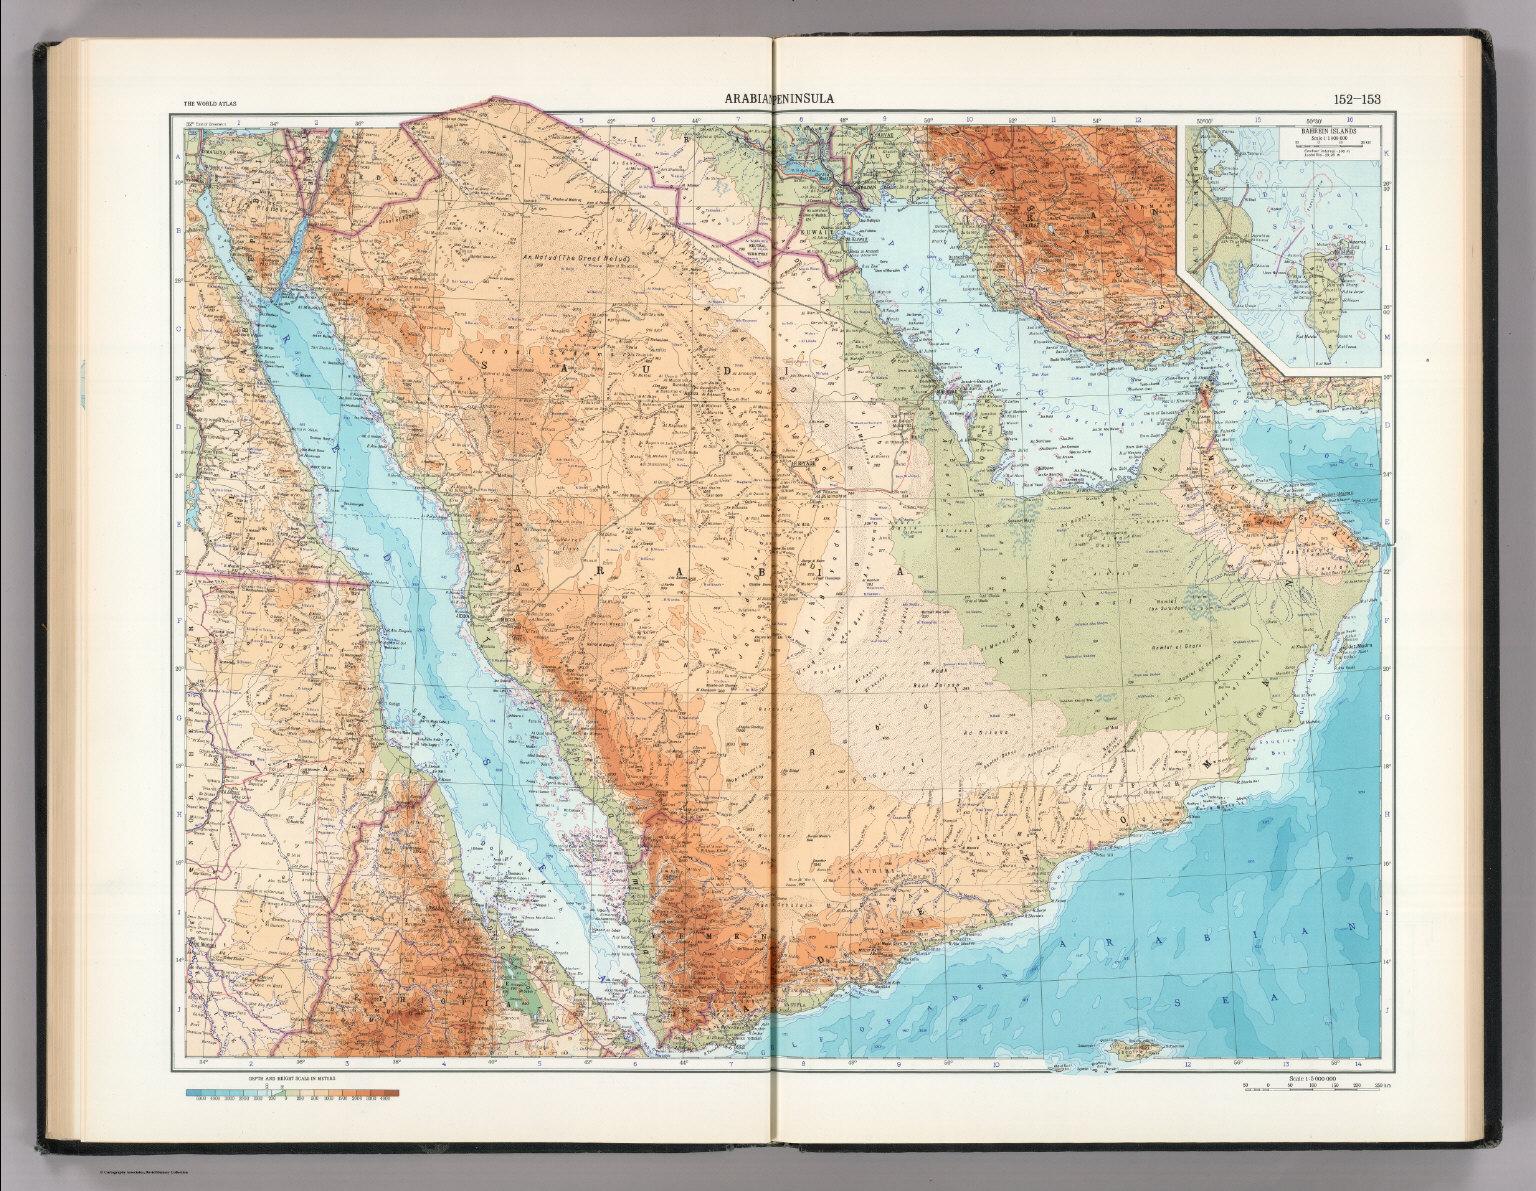 152 153 arabian peninsula bahrein bahrain islands the world 152 153 arabian peninsula bahrein bahrain islands the world atlas gumiabroncs Gallery